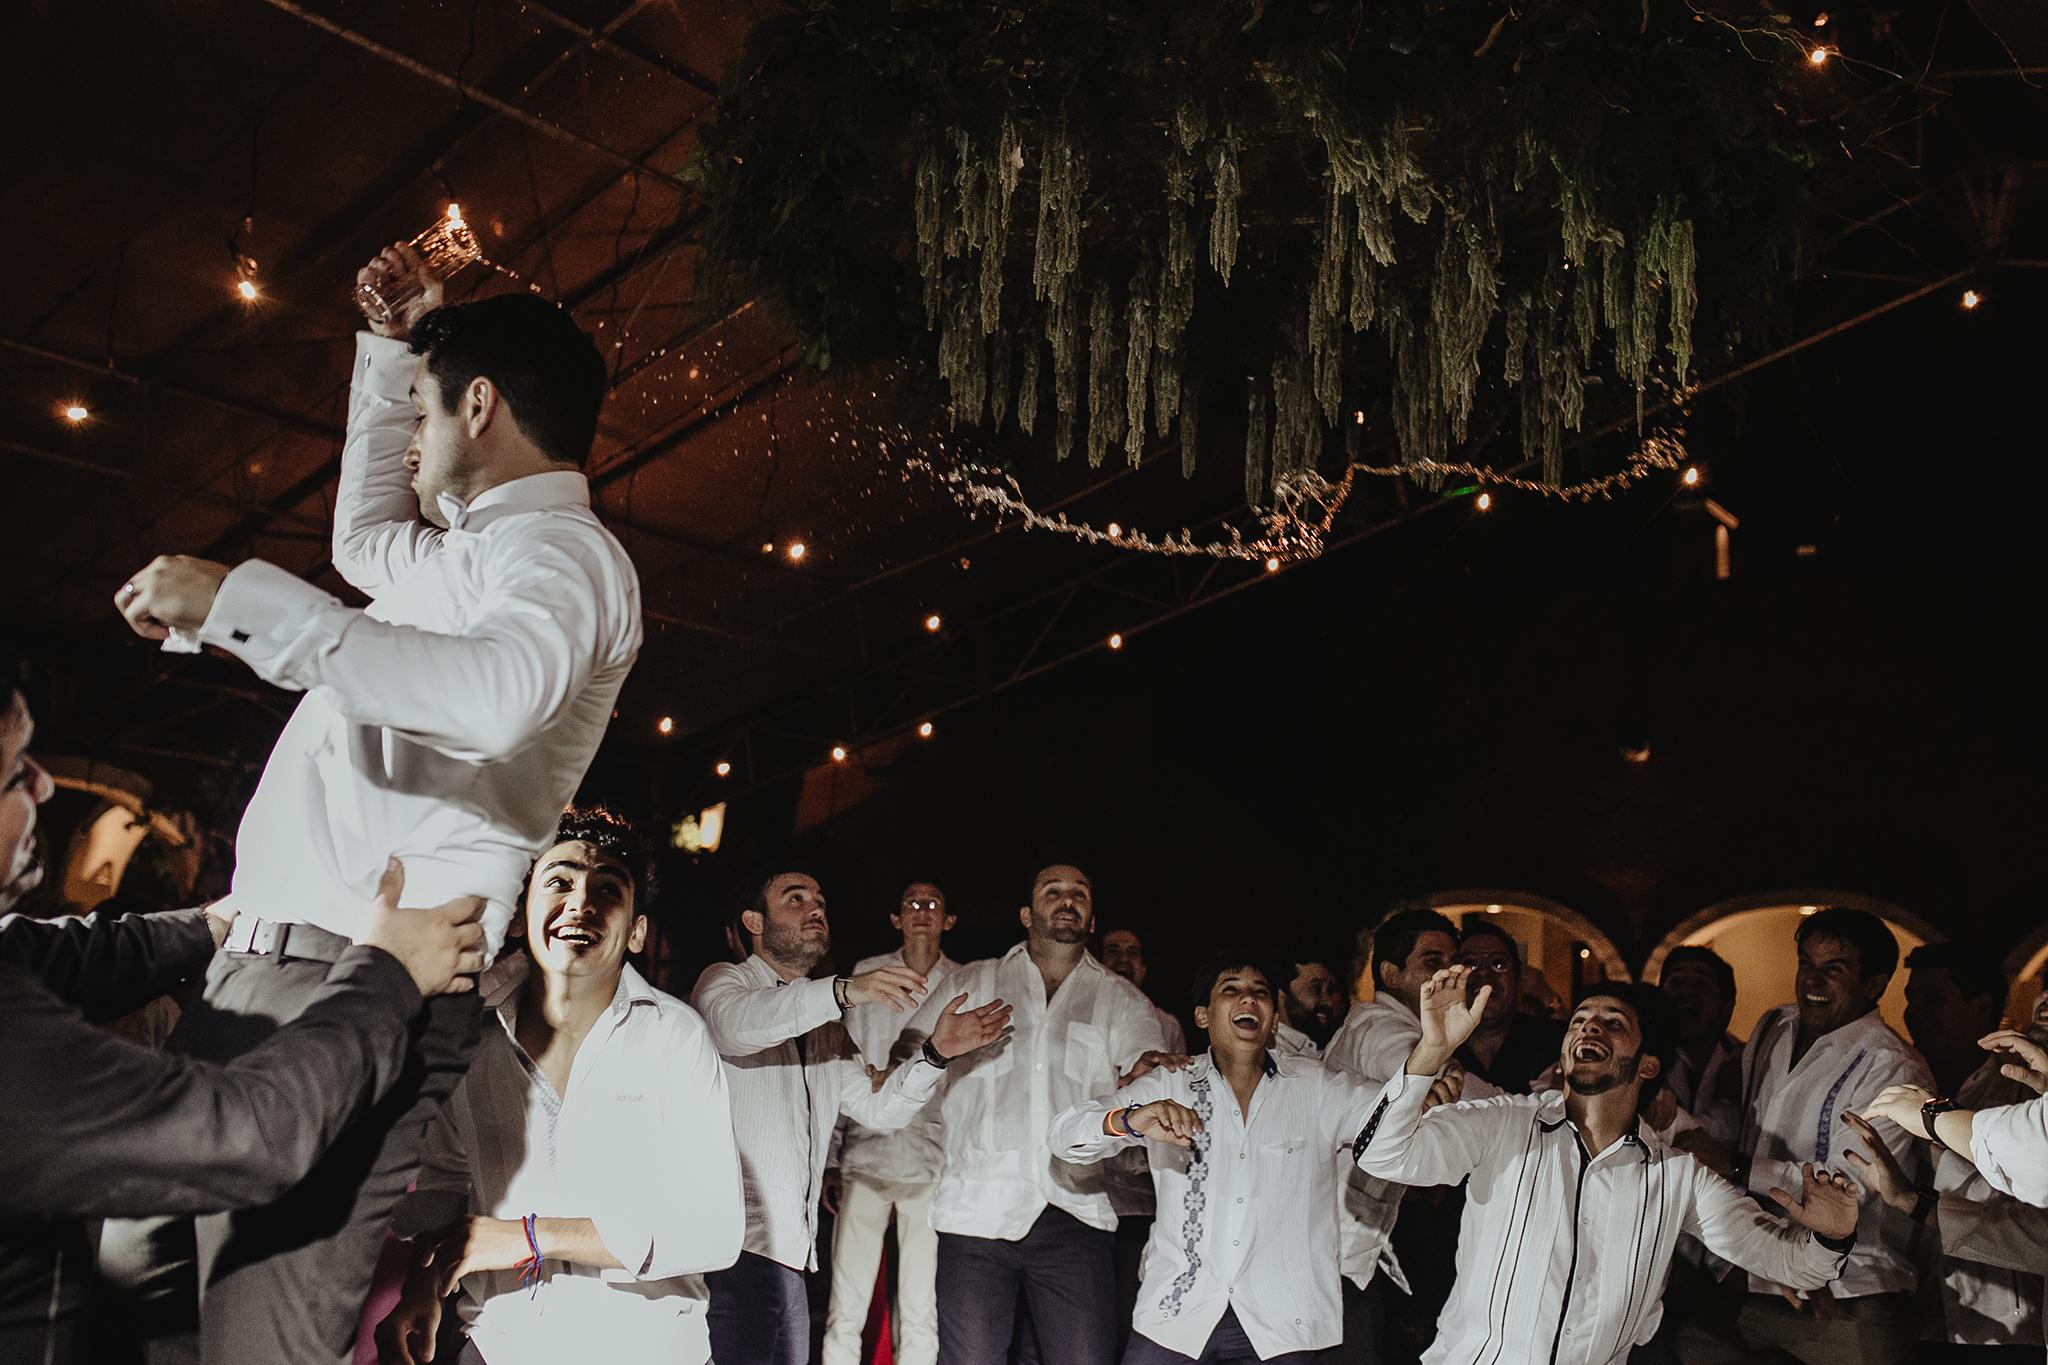 1456R&F__WeddingDestination_Weddingmerida_BodaMexico_FotografoDeBodas_FabrizioSimoneenFotografo.jpg